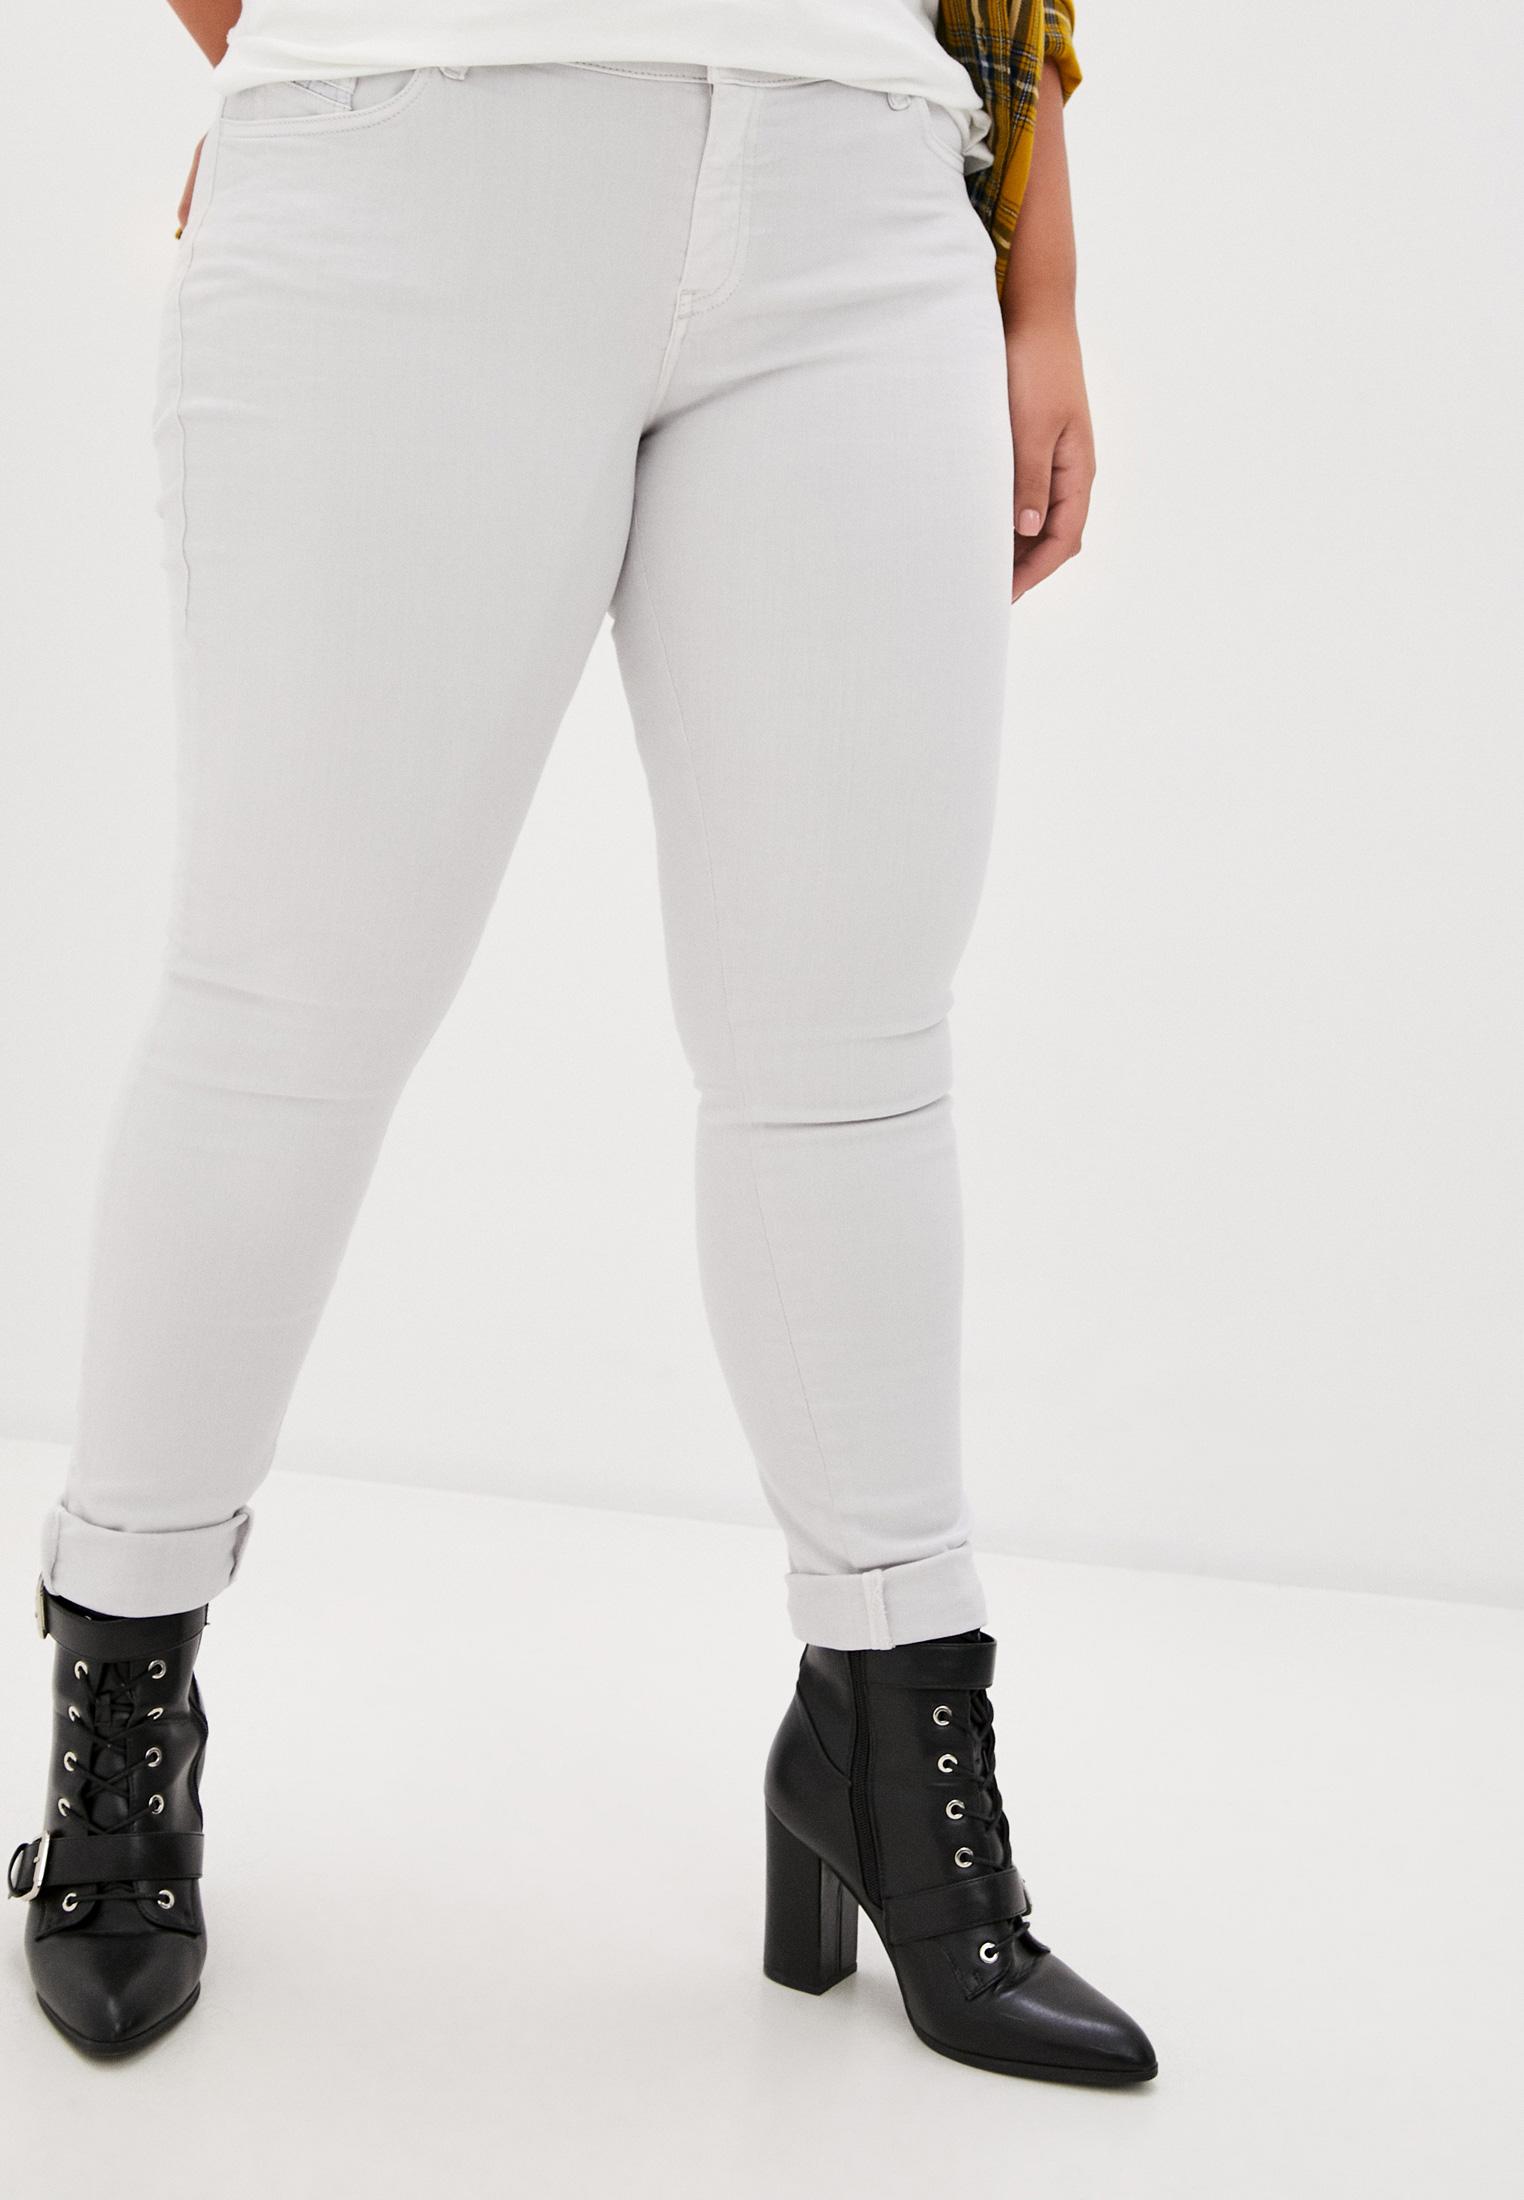 Зауженные джинсы Diesel (Дизель) 00SXJN084BZ